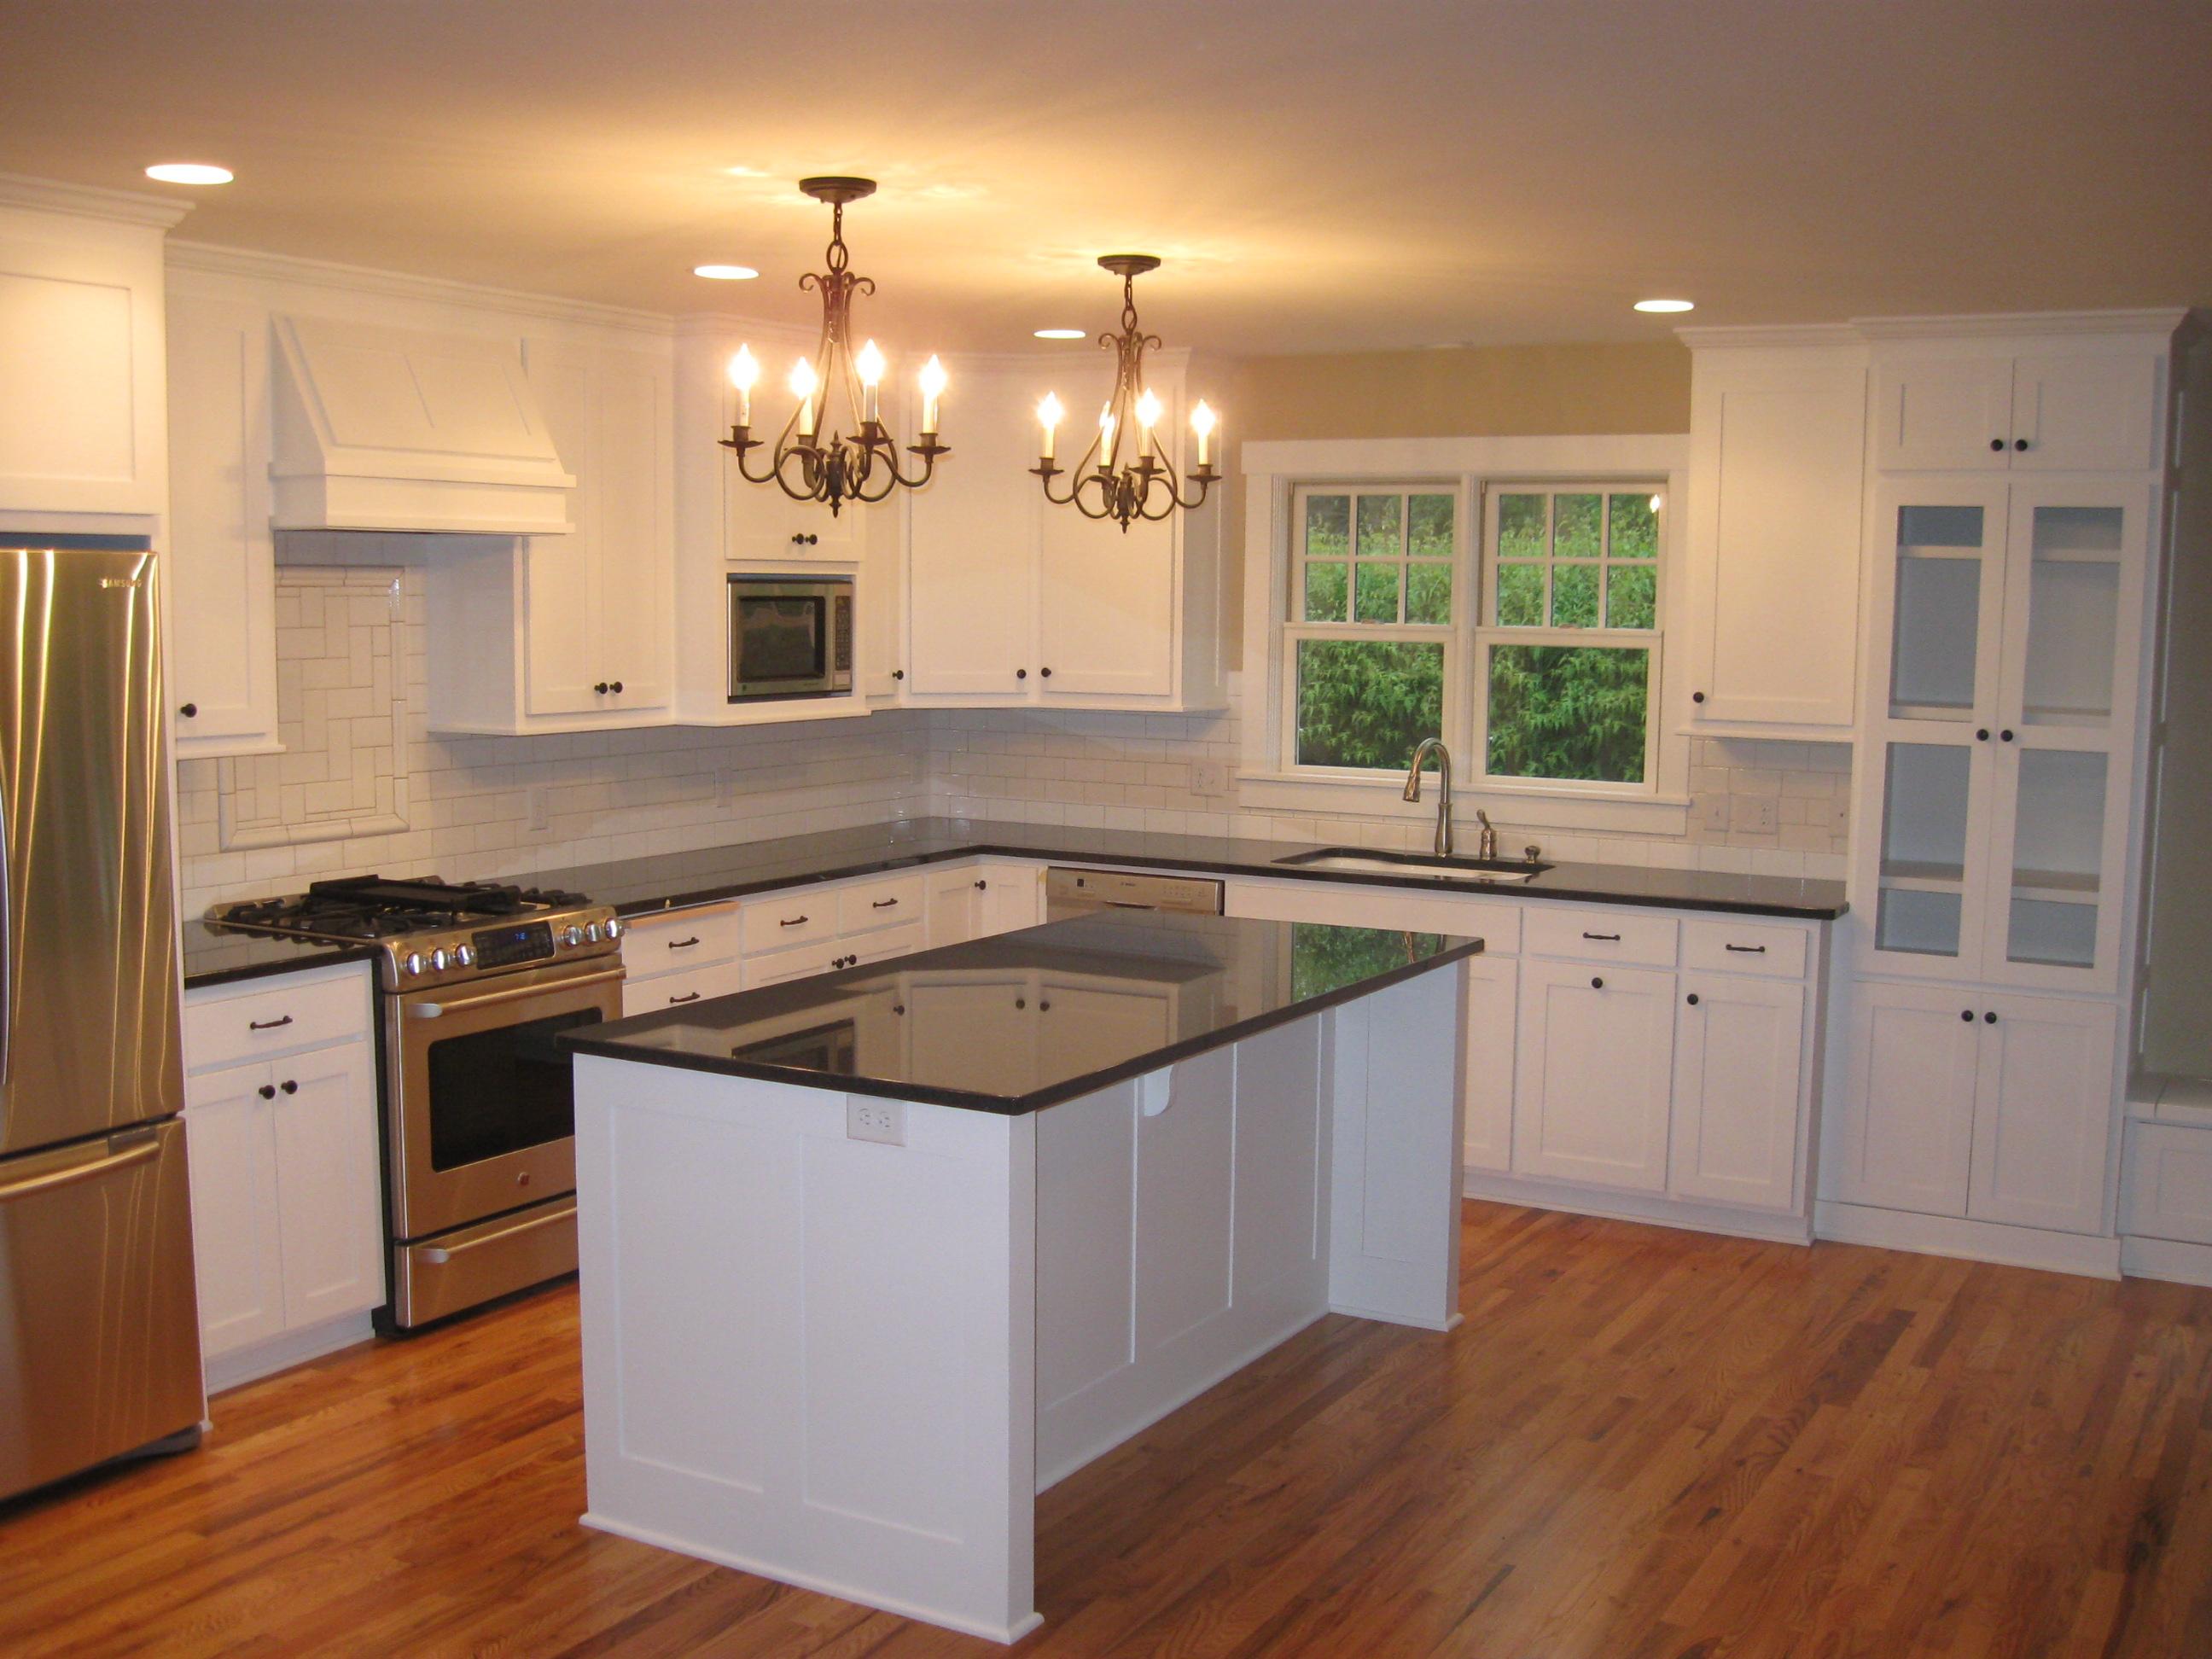 wall cabinets for kitchen cabinets for kitchen Wall cabinets for kitchen Photo 6